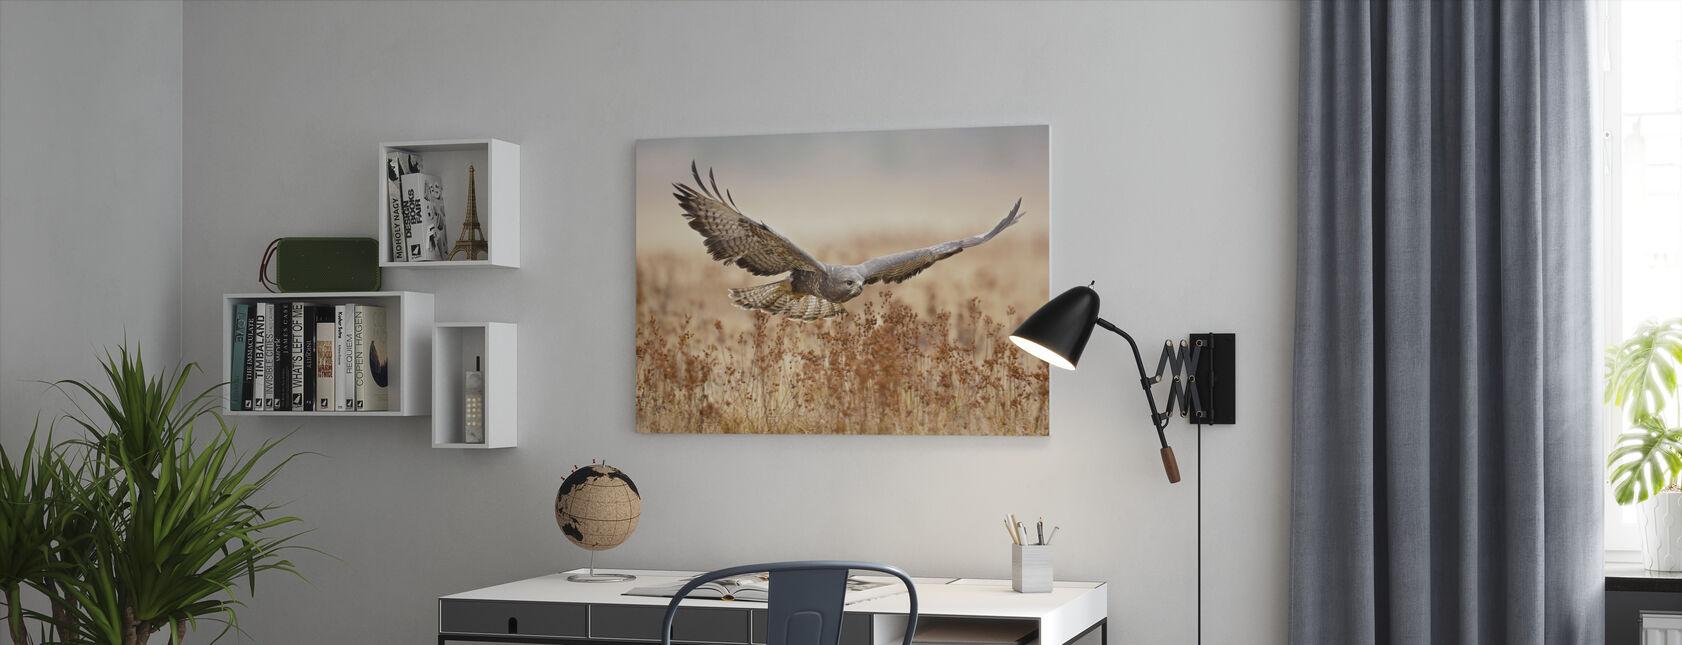 Common Buzzard - Canvas print - Office